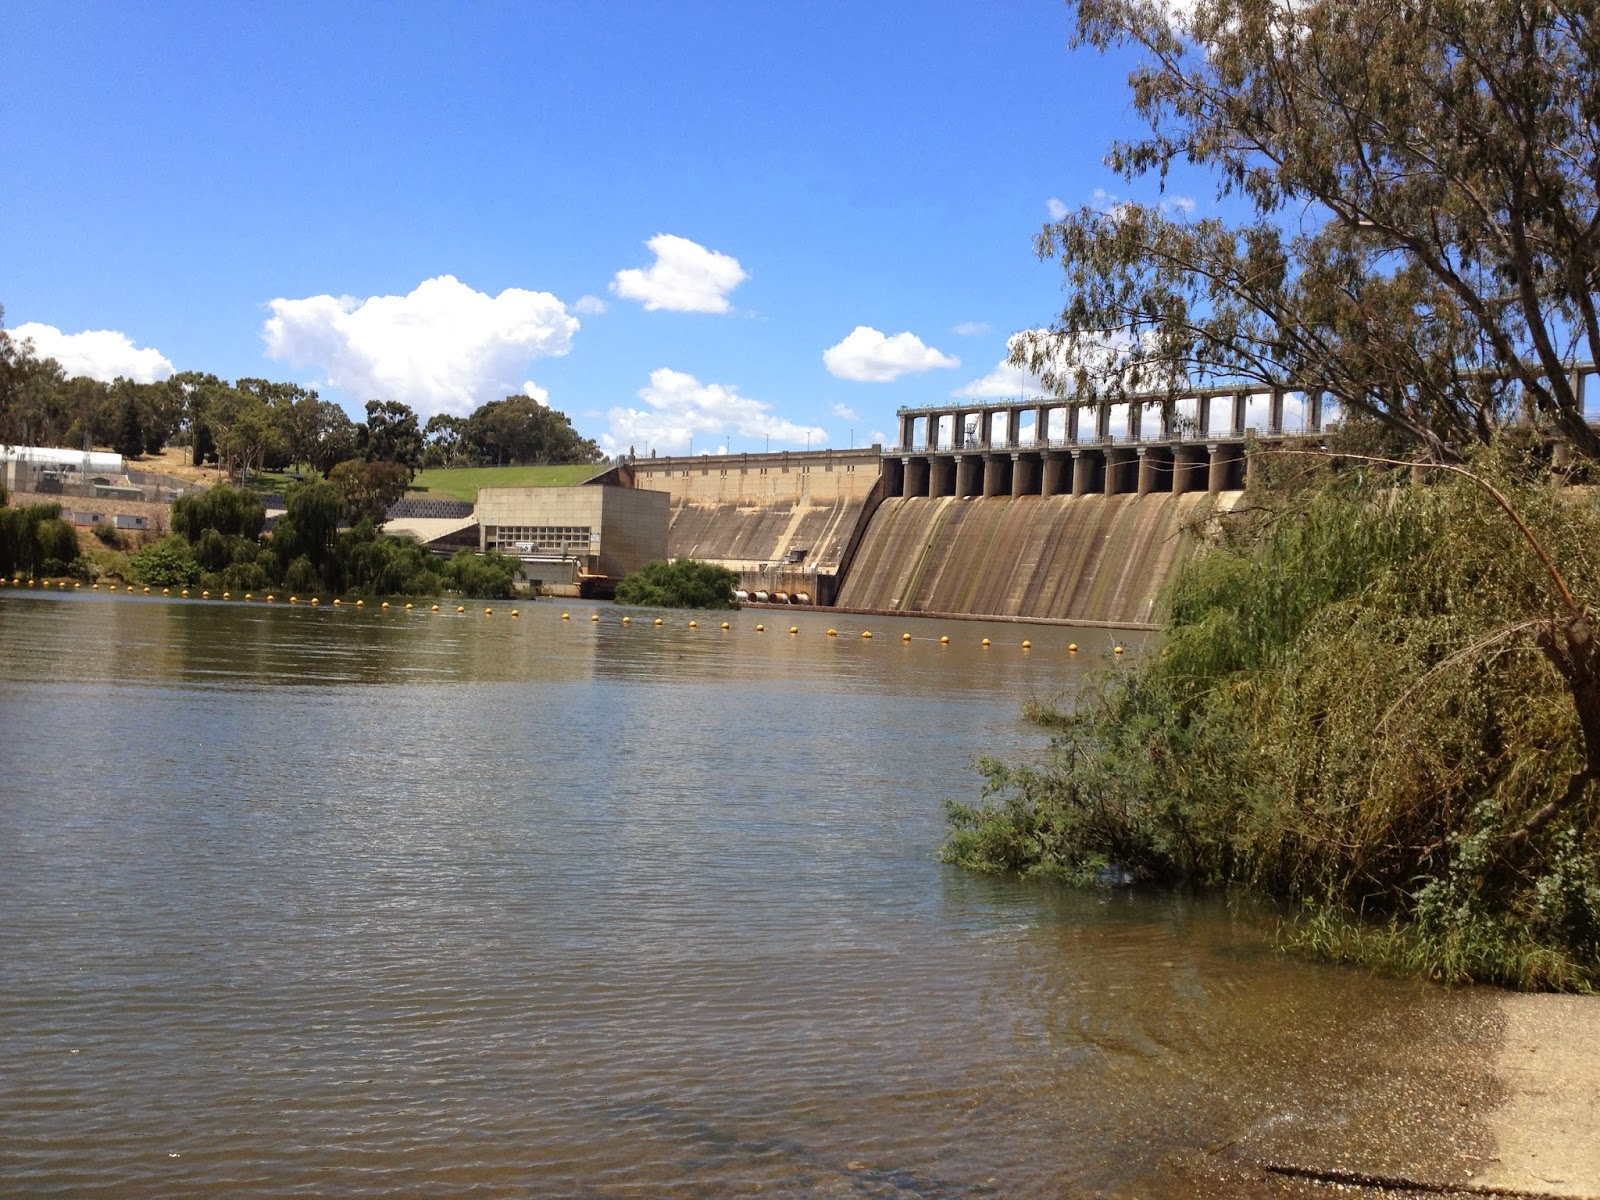 Murray River Kayak : Why the Hume Dam?